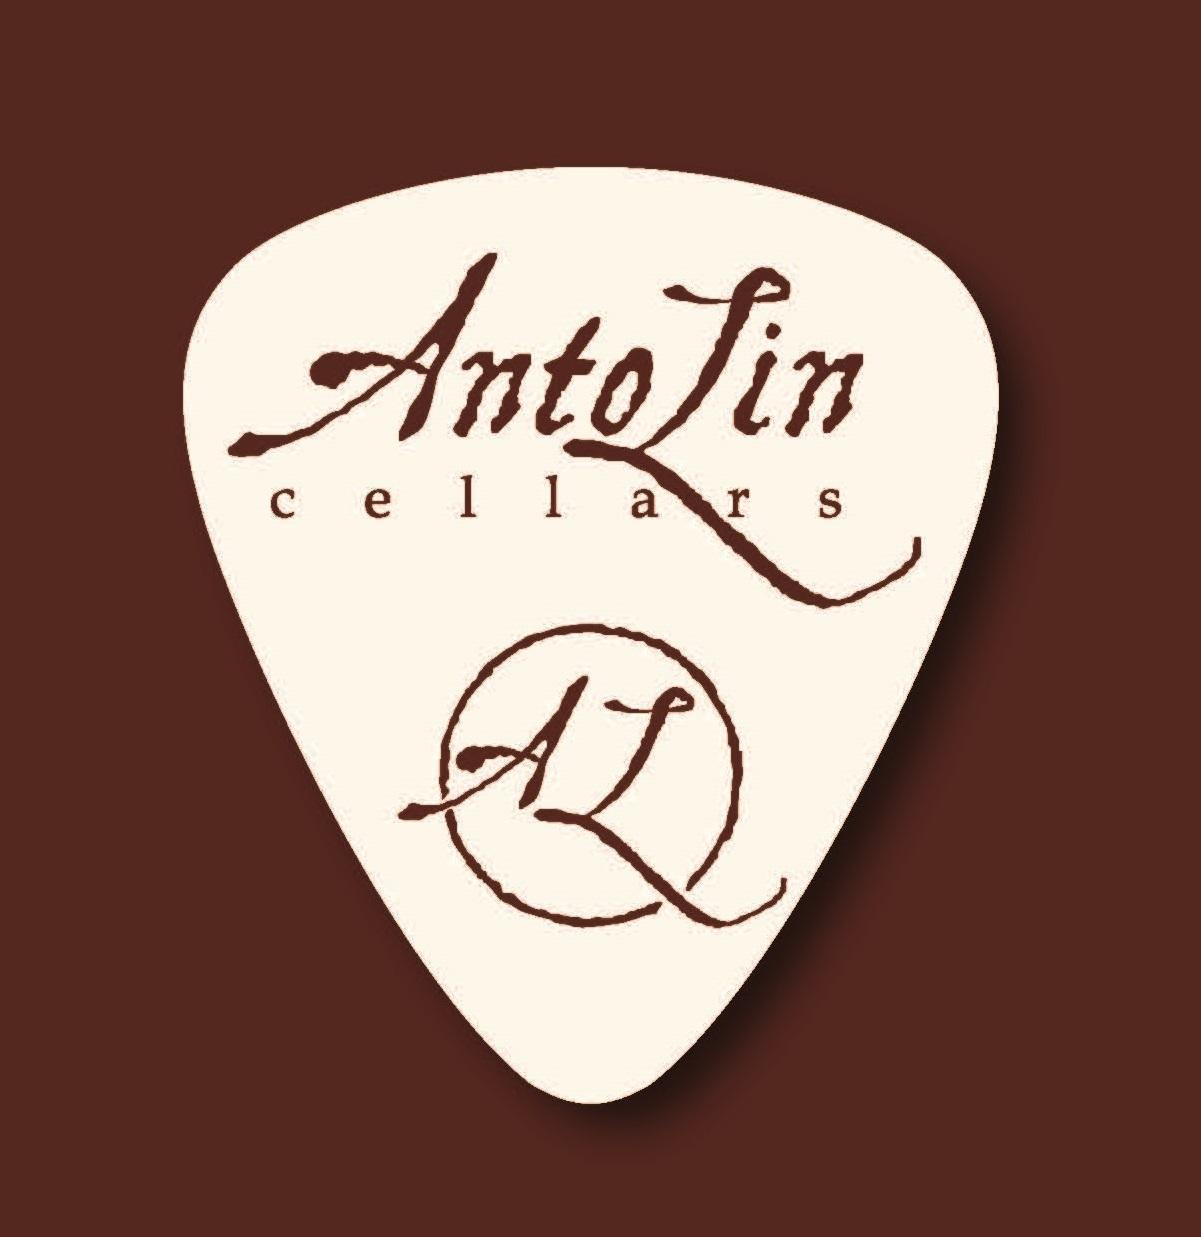 ALC CC Photo Guitar Pick Cabernet Background Crop B - AntoLin Cellars presents Die BrÜder